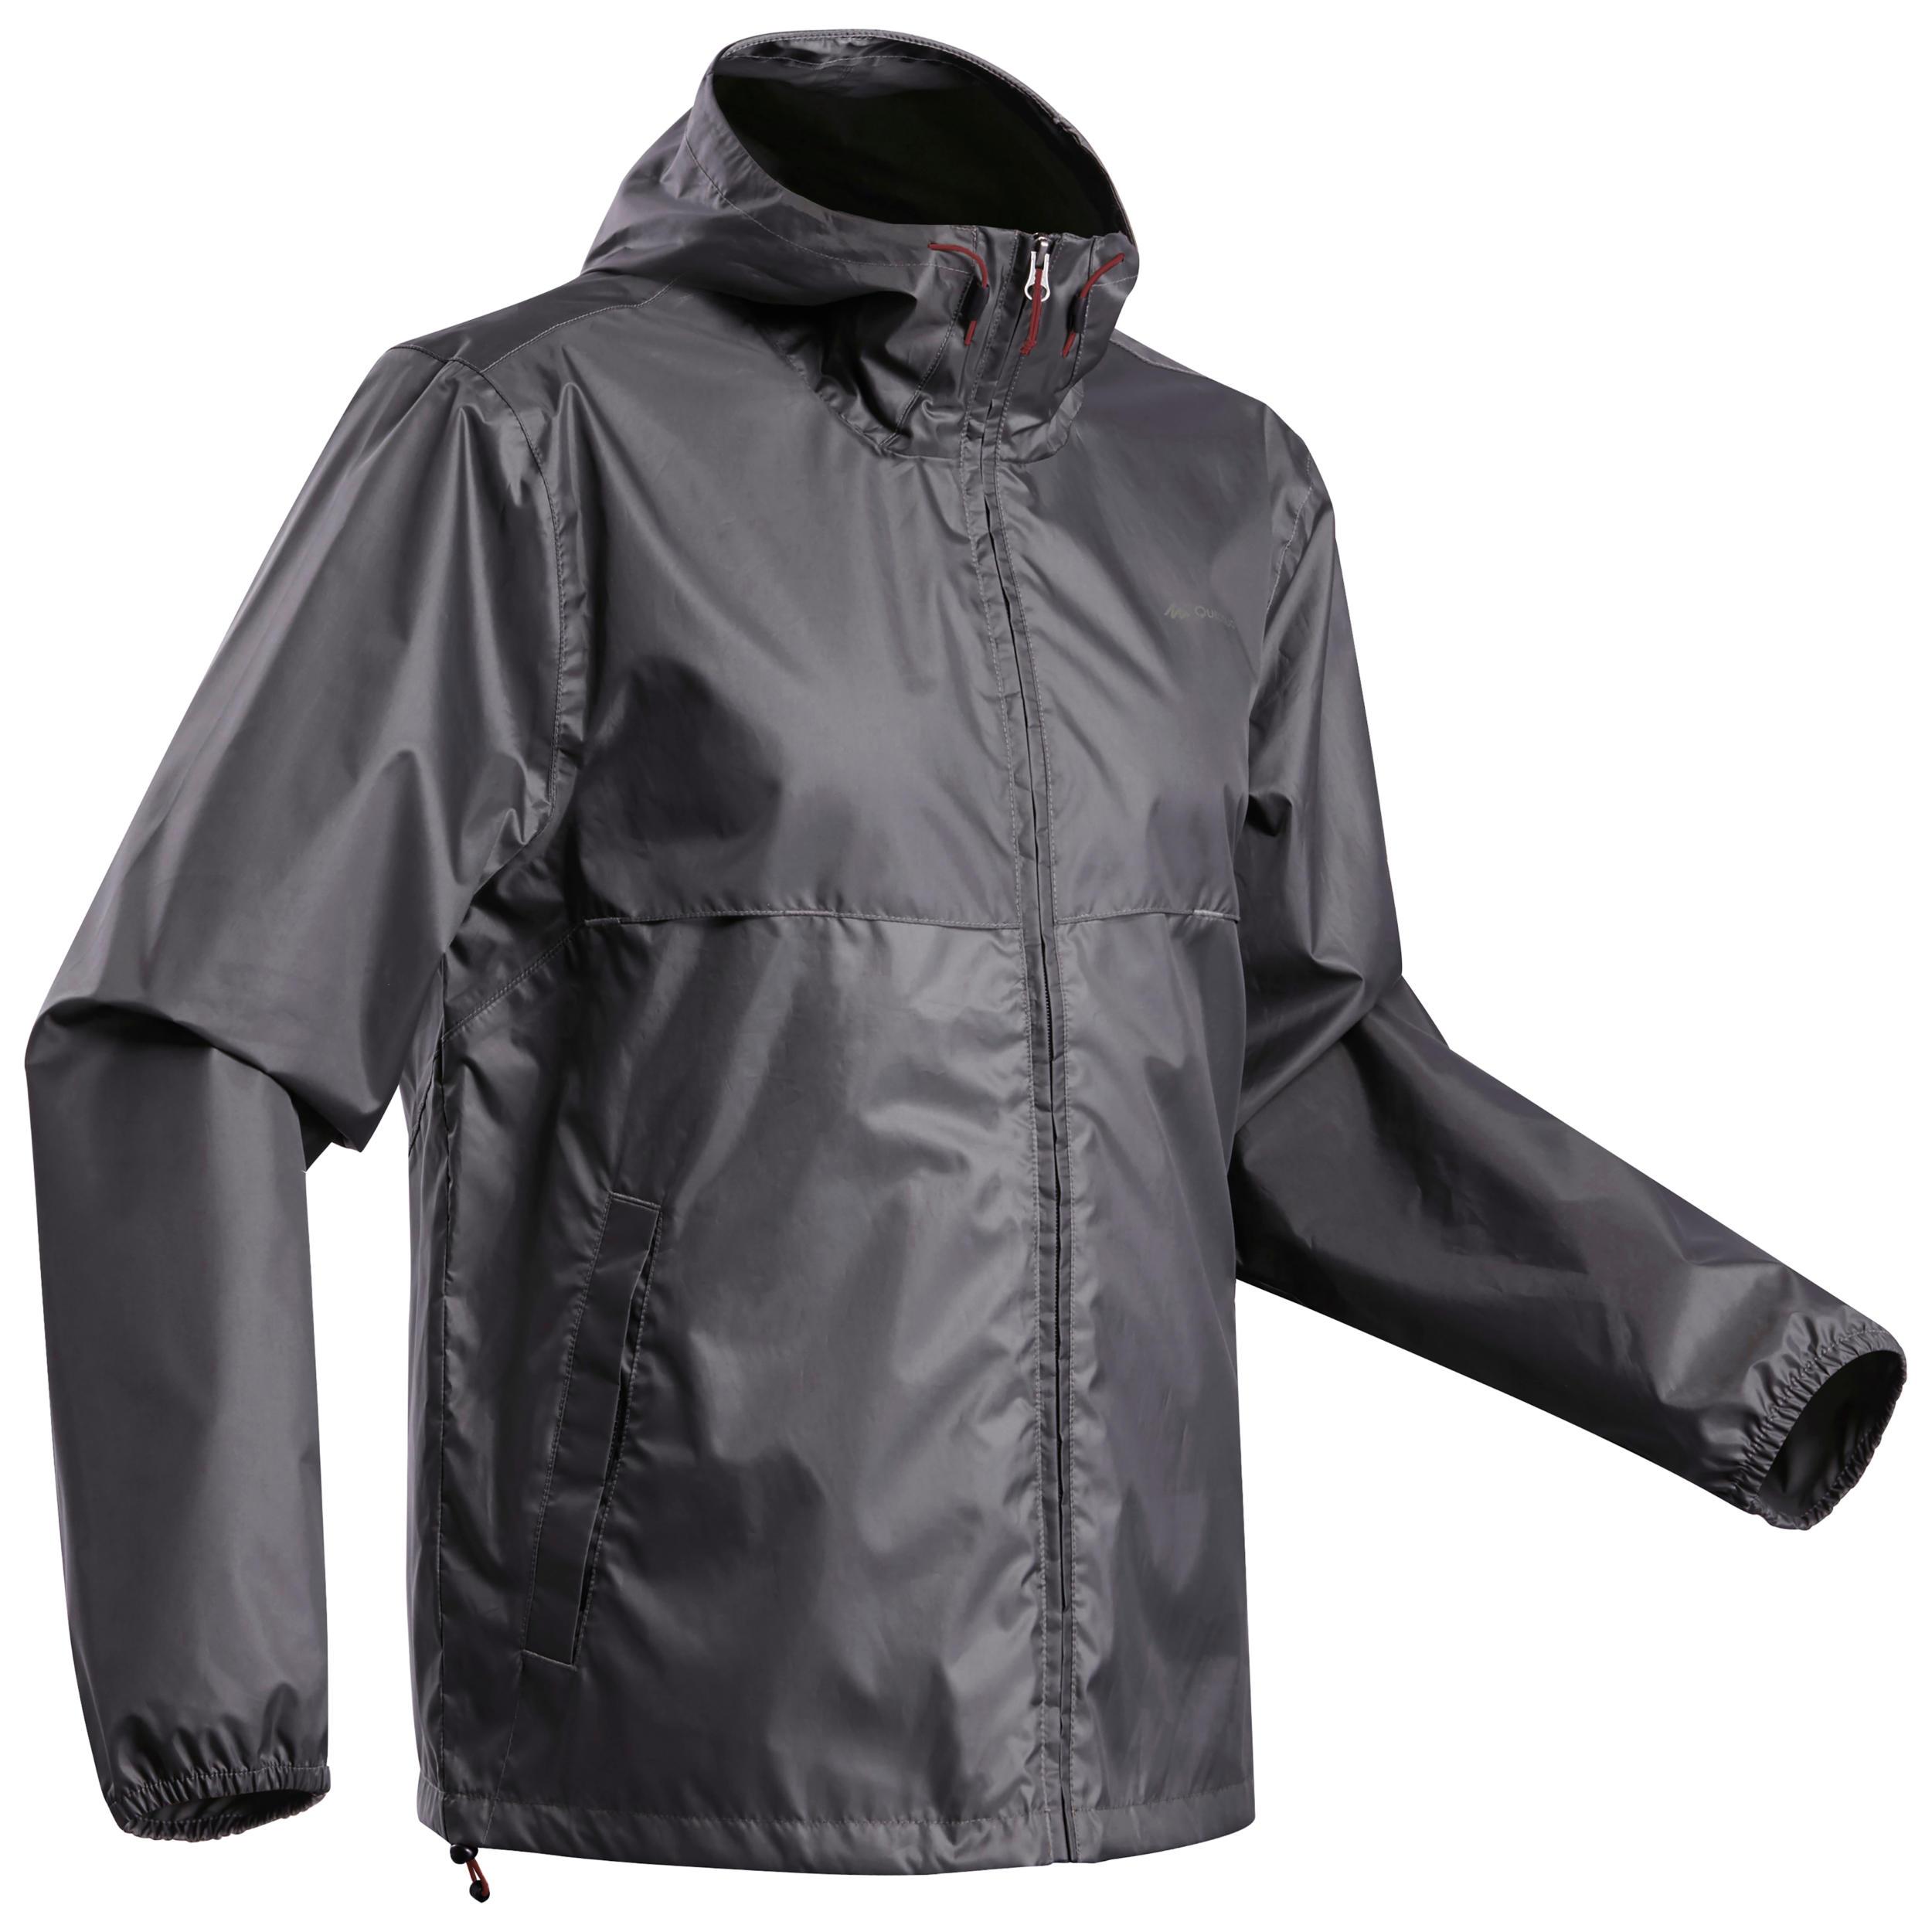 Jachetă ploaie NH100 Raincut imagine